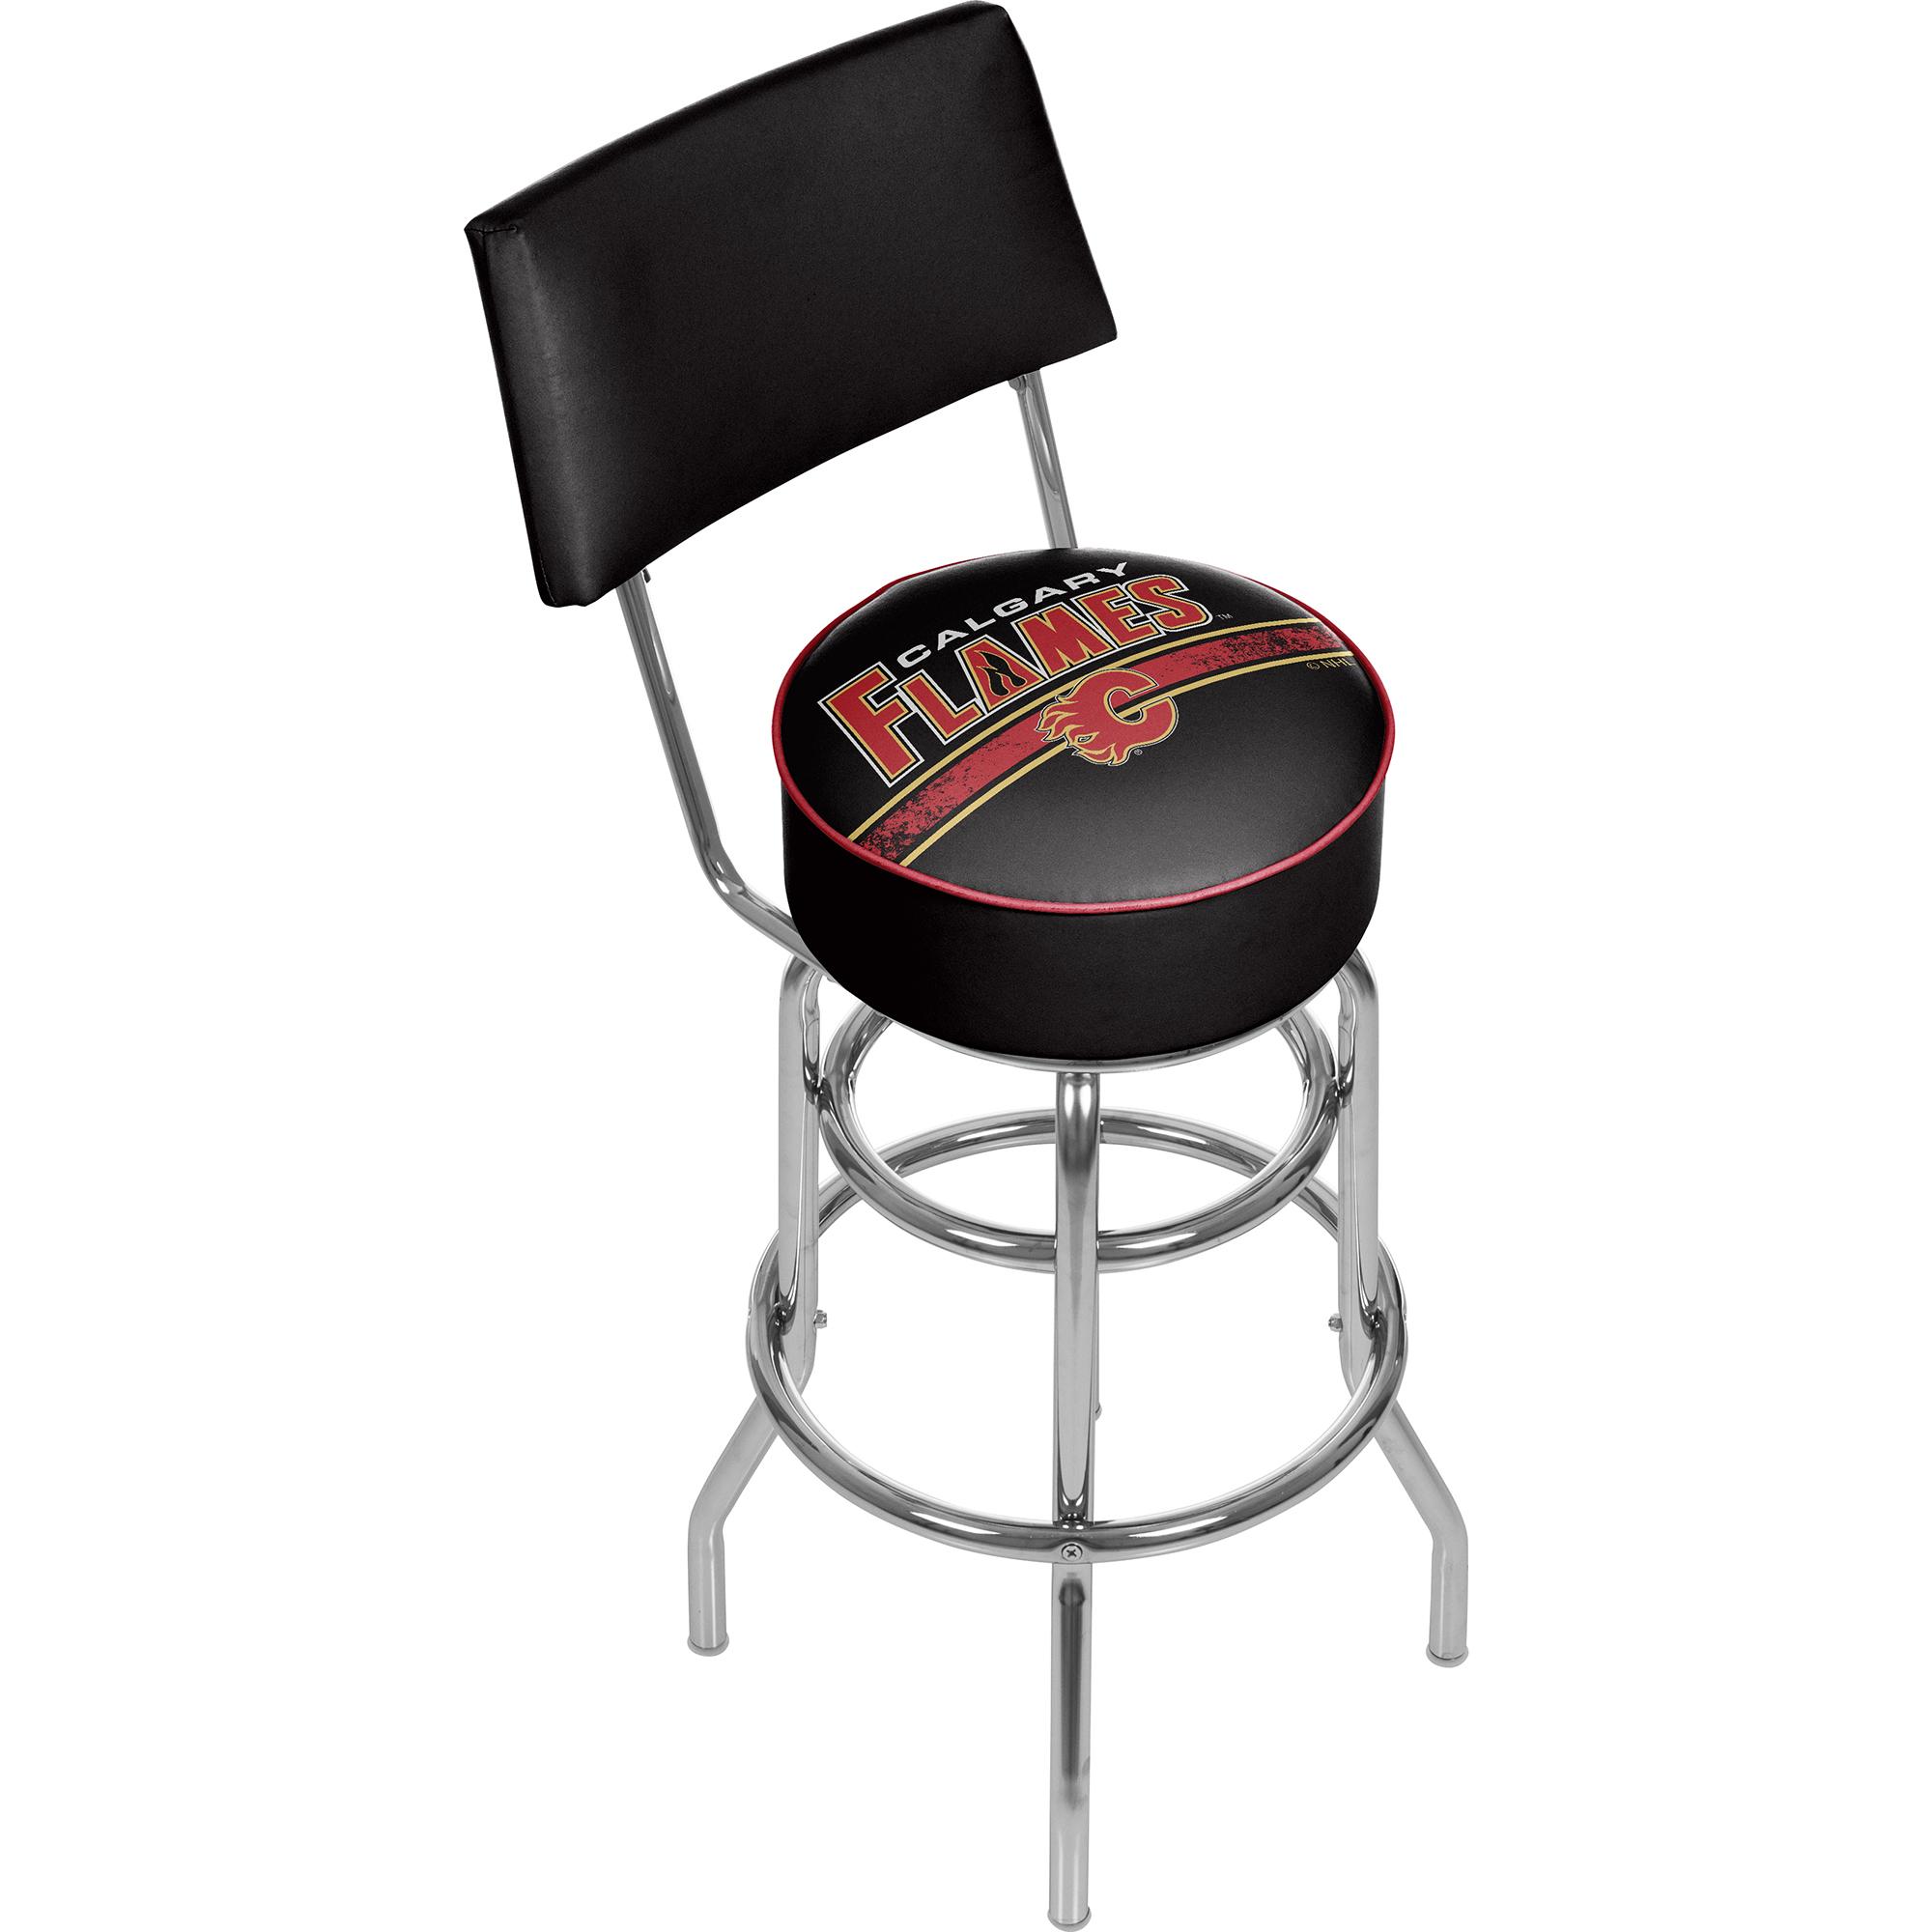 NHL Swivel Swivel Bar Stool with Back - Calgary Flames 589b8bebc98fc43a026d1106